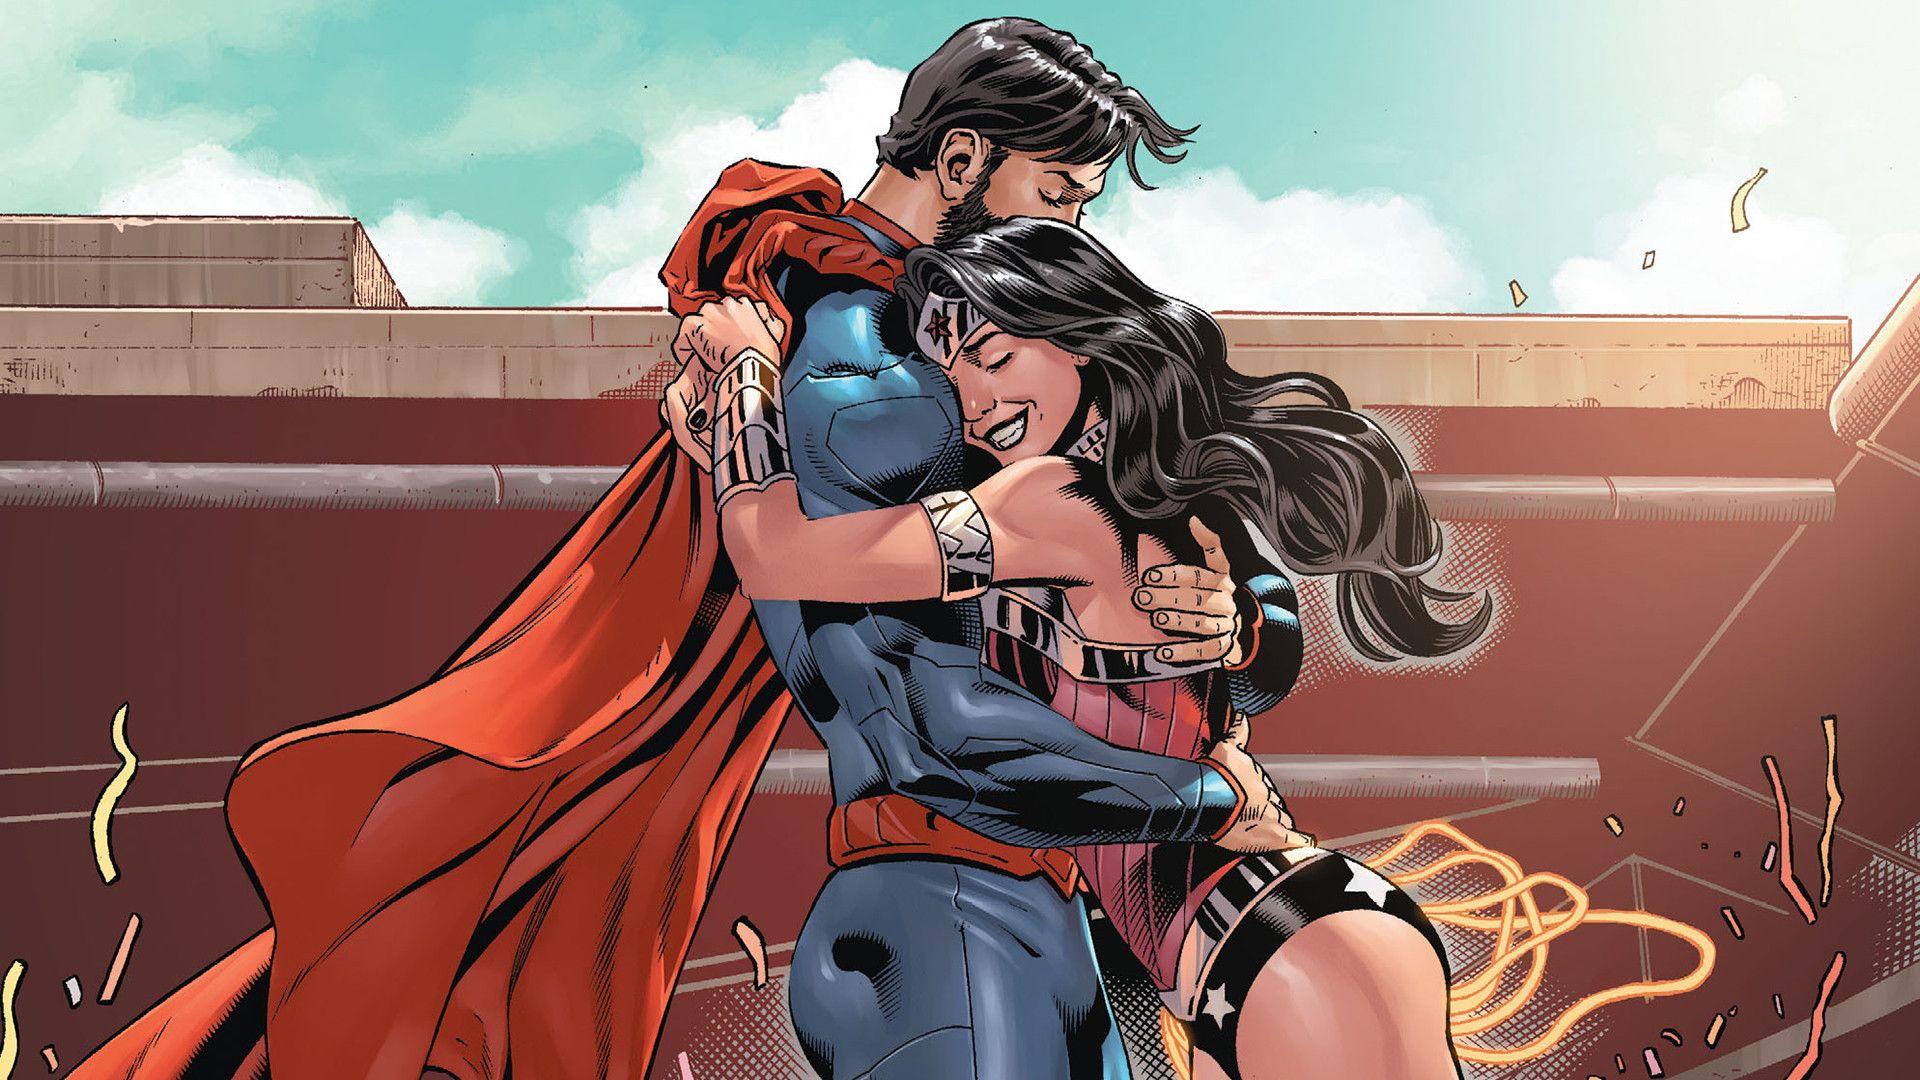 Superman Wonder Woman Computer Wallpapers Desktop Backgrounds 1920x1080 Id 567778 Superman Wonder Woman Wonder Woman Comic Wonder Woman